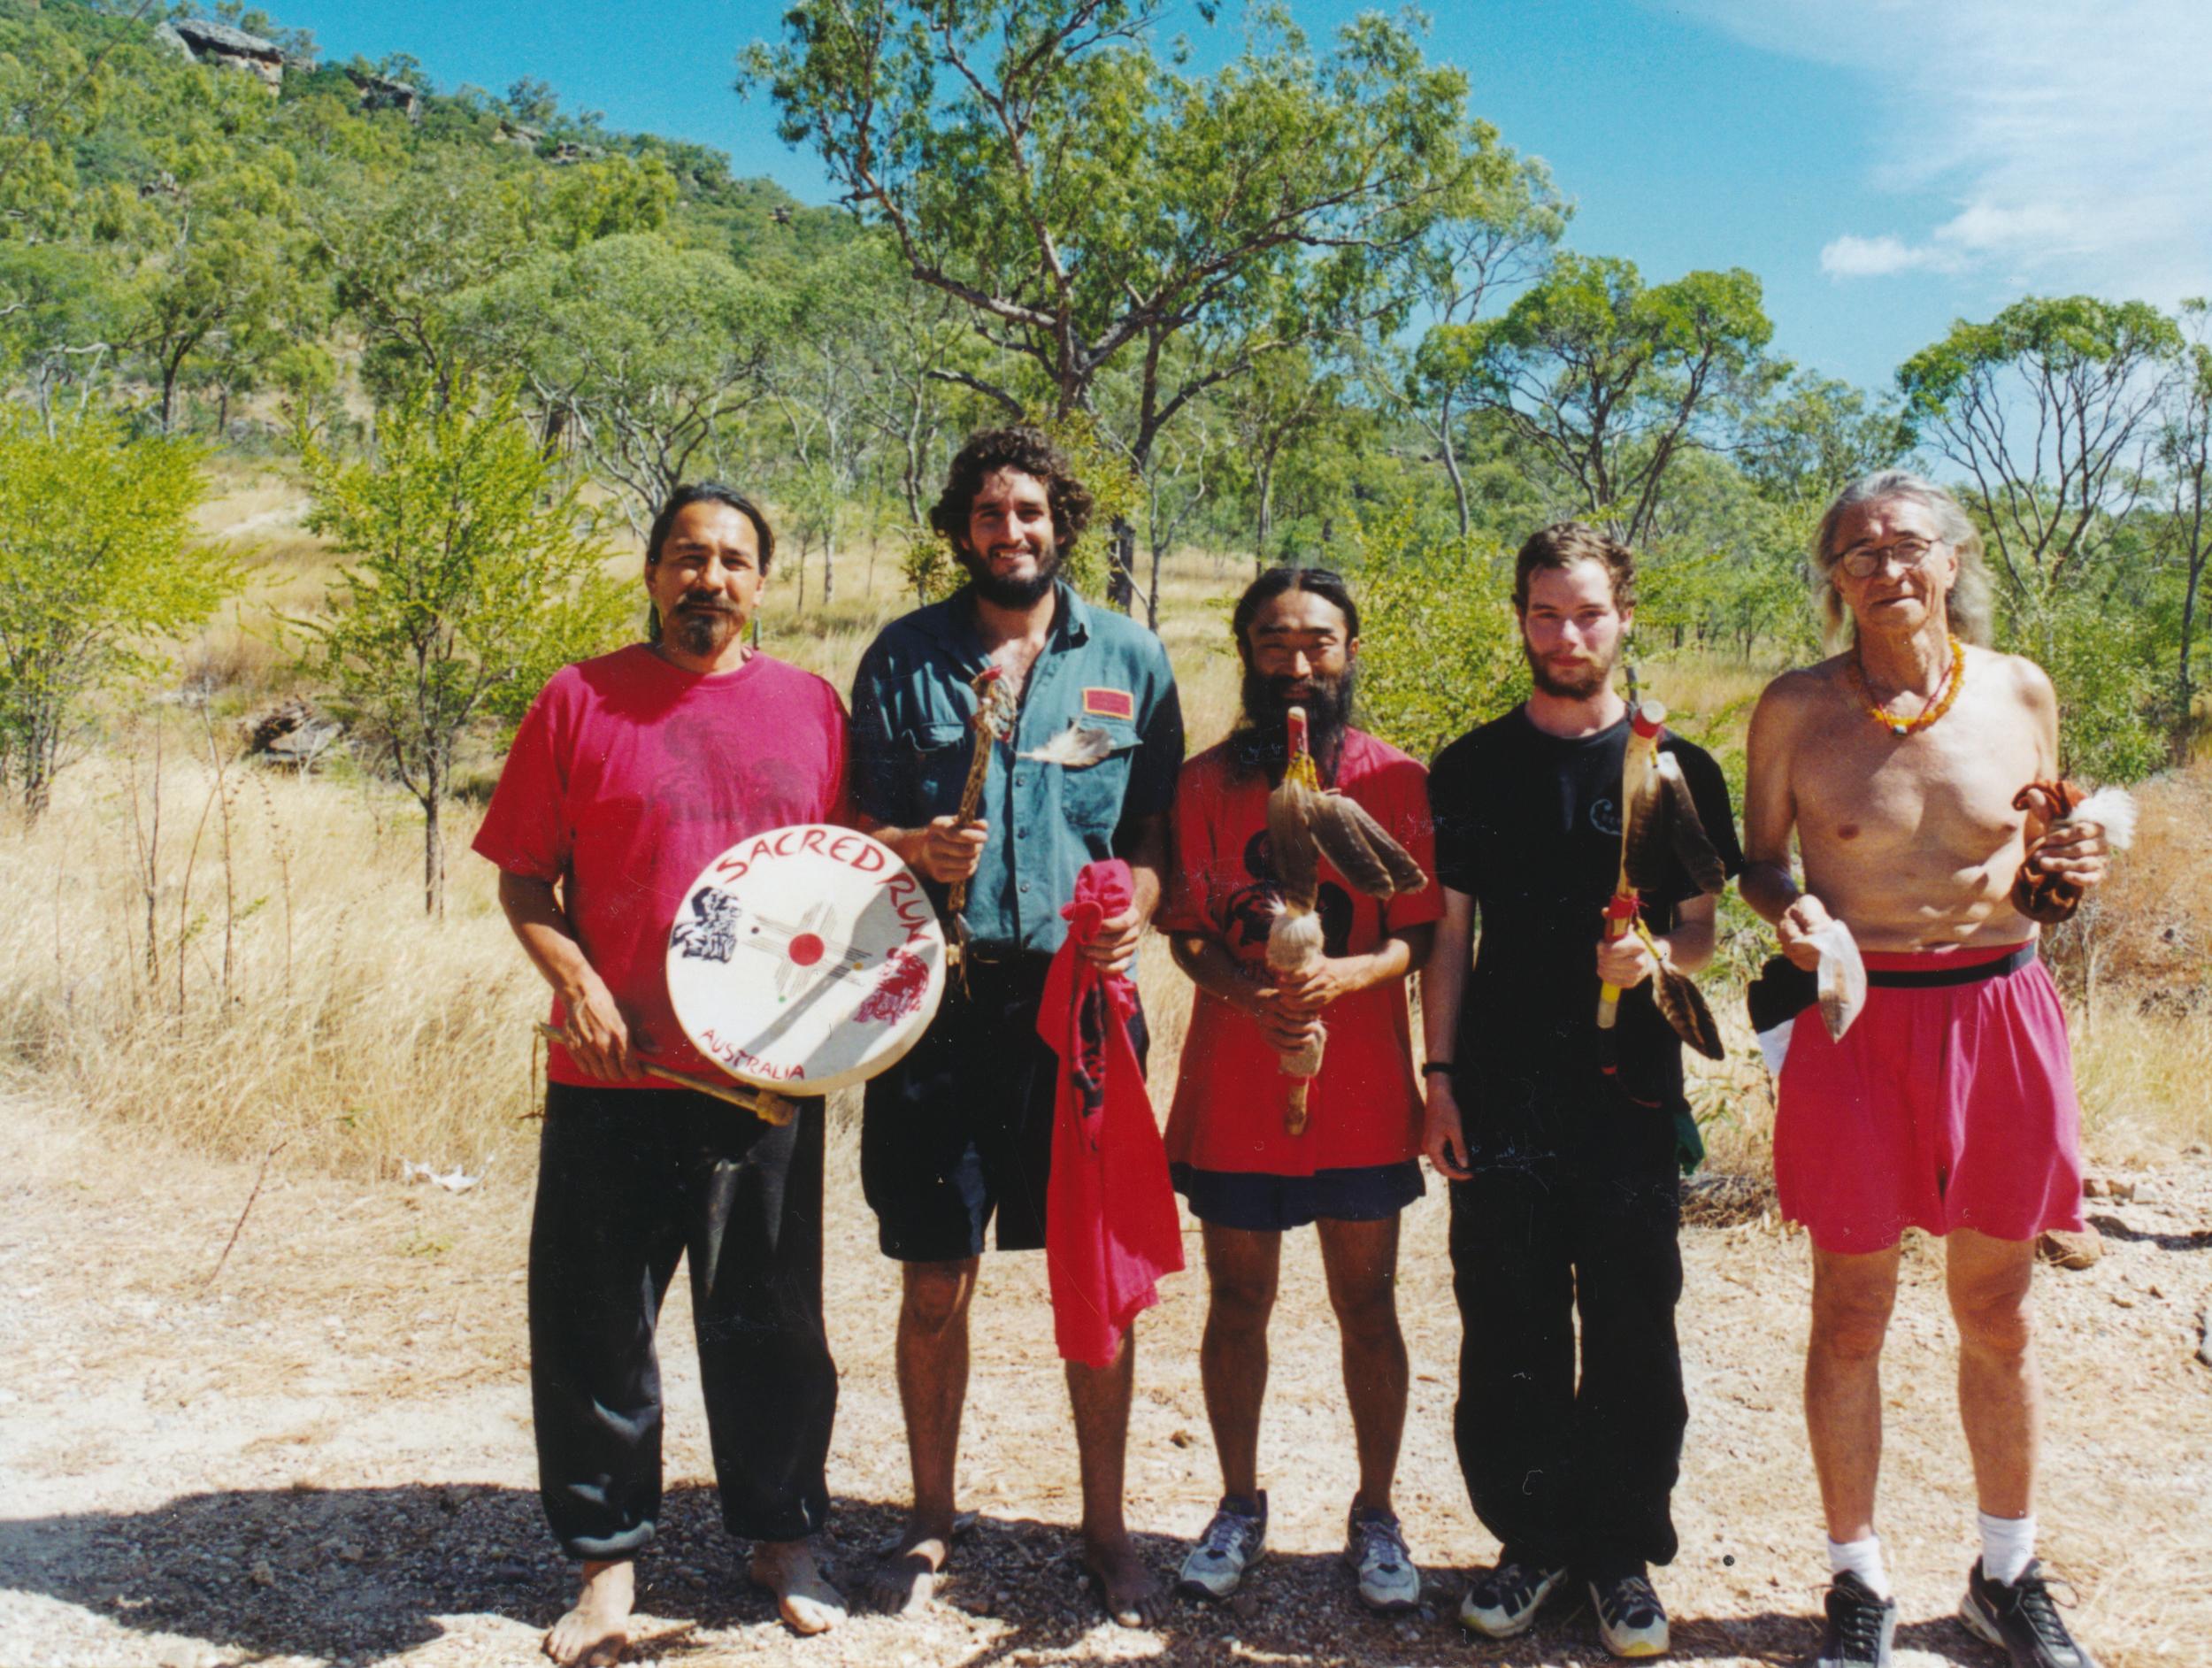 Gorran Gilkerson (2nd left) at Split Rock Aboriginal art area near Laura, Queensland, Australia